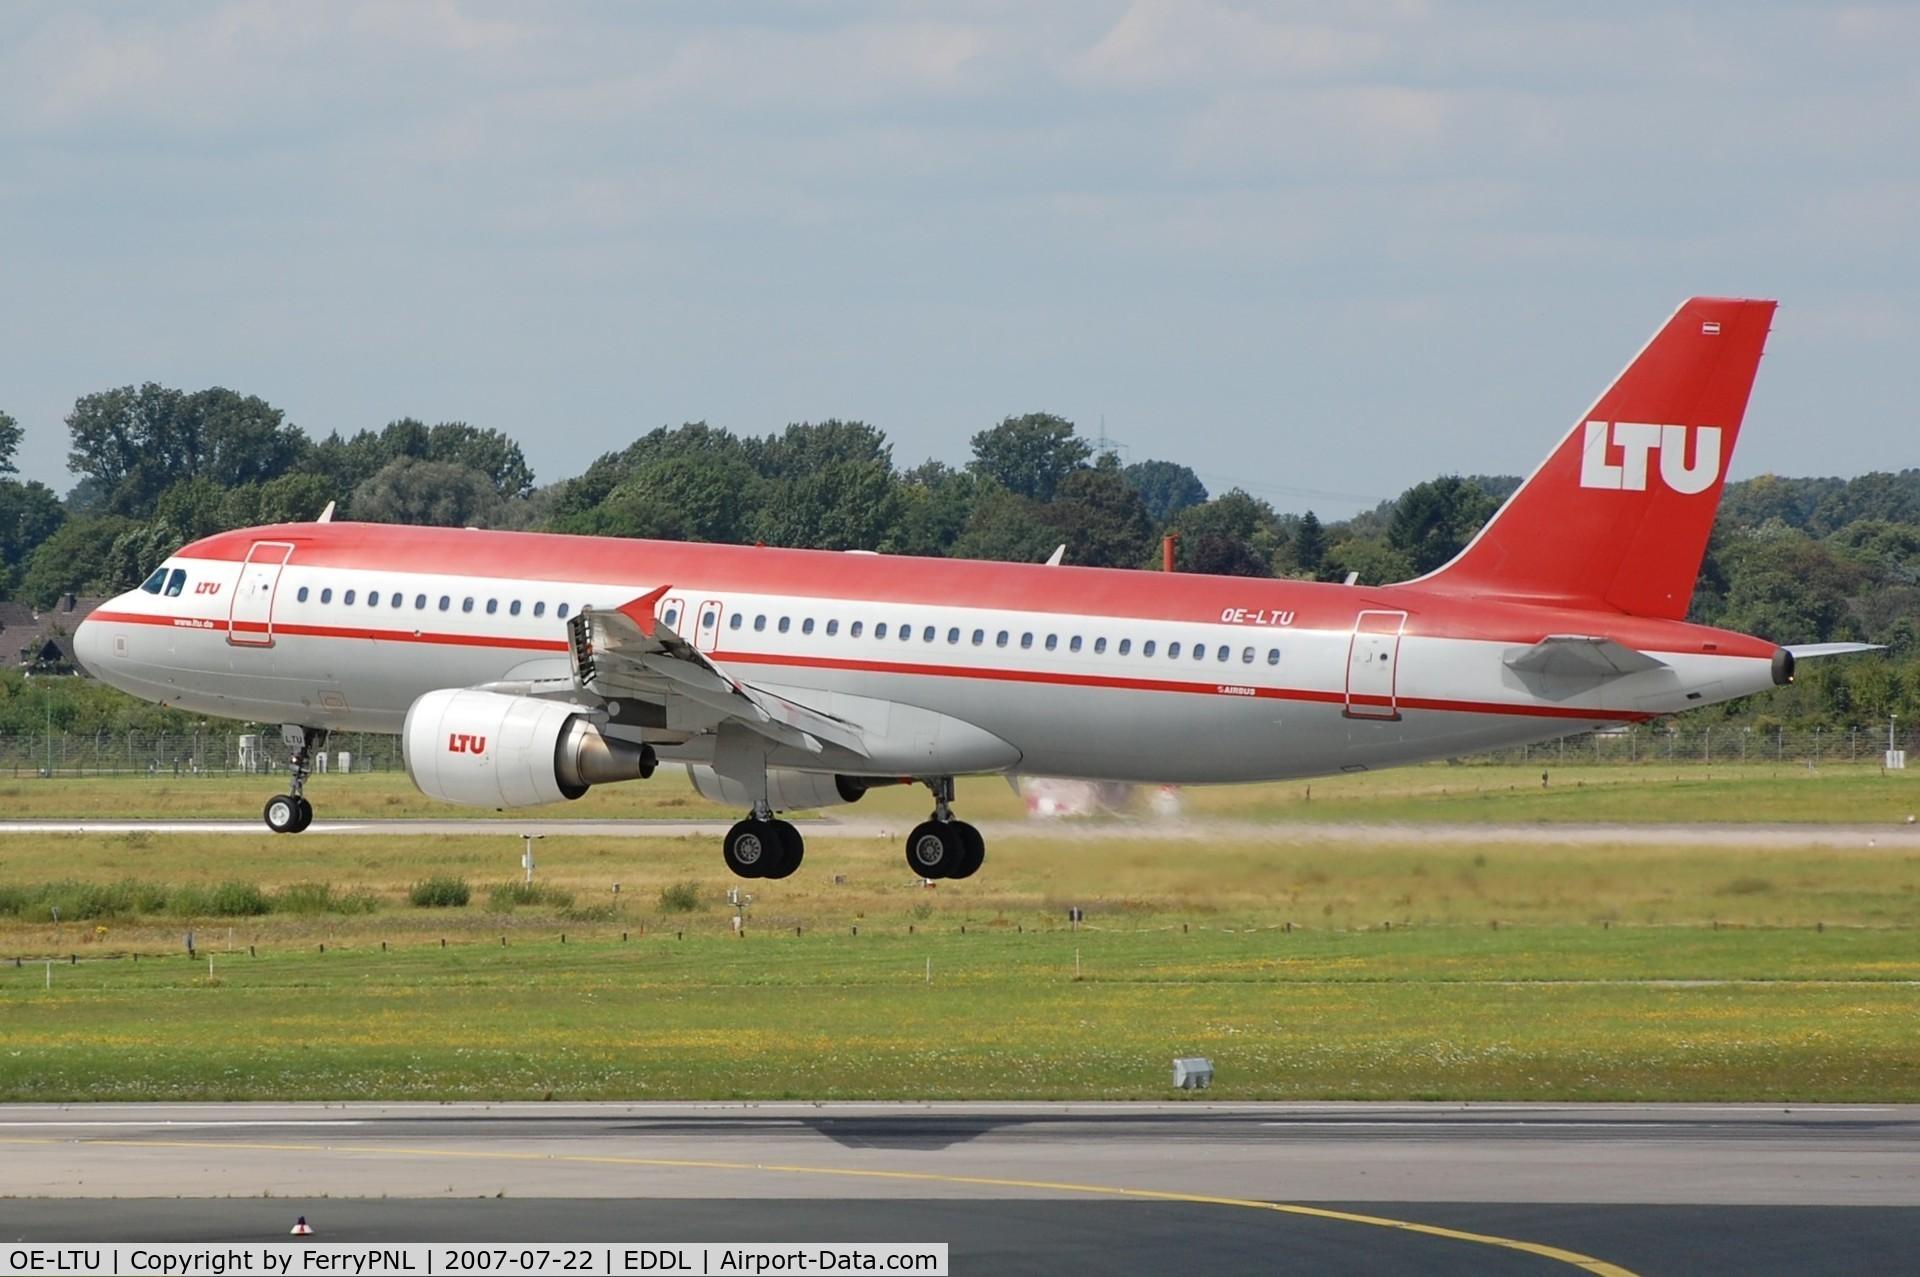 OE-LTU, 2001 Airbus A320-214 C/N 1504, Austrian LTU A320 landing in DUS